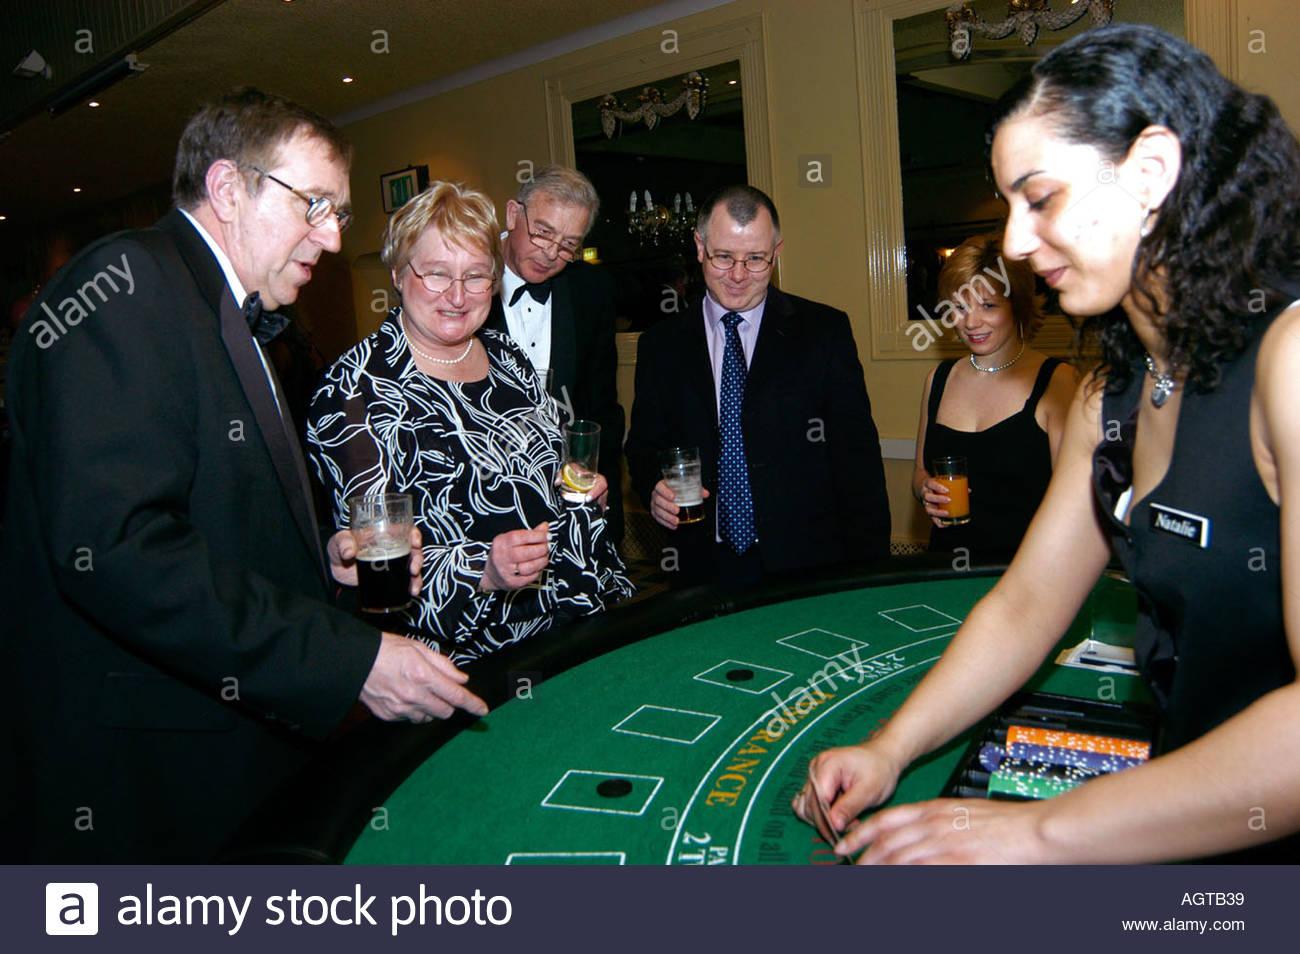 Potawatomi poker room review